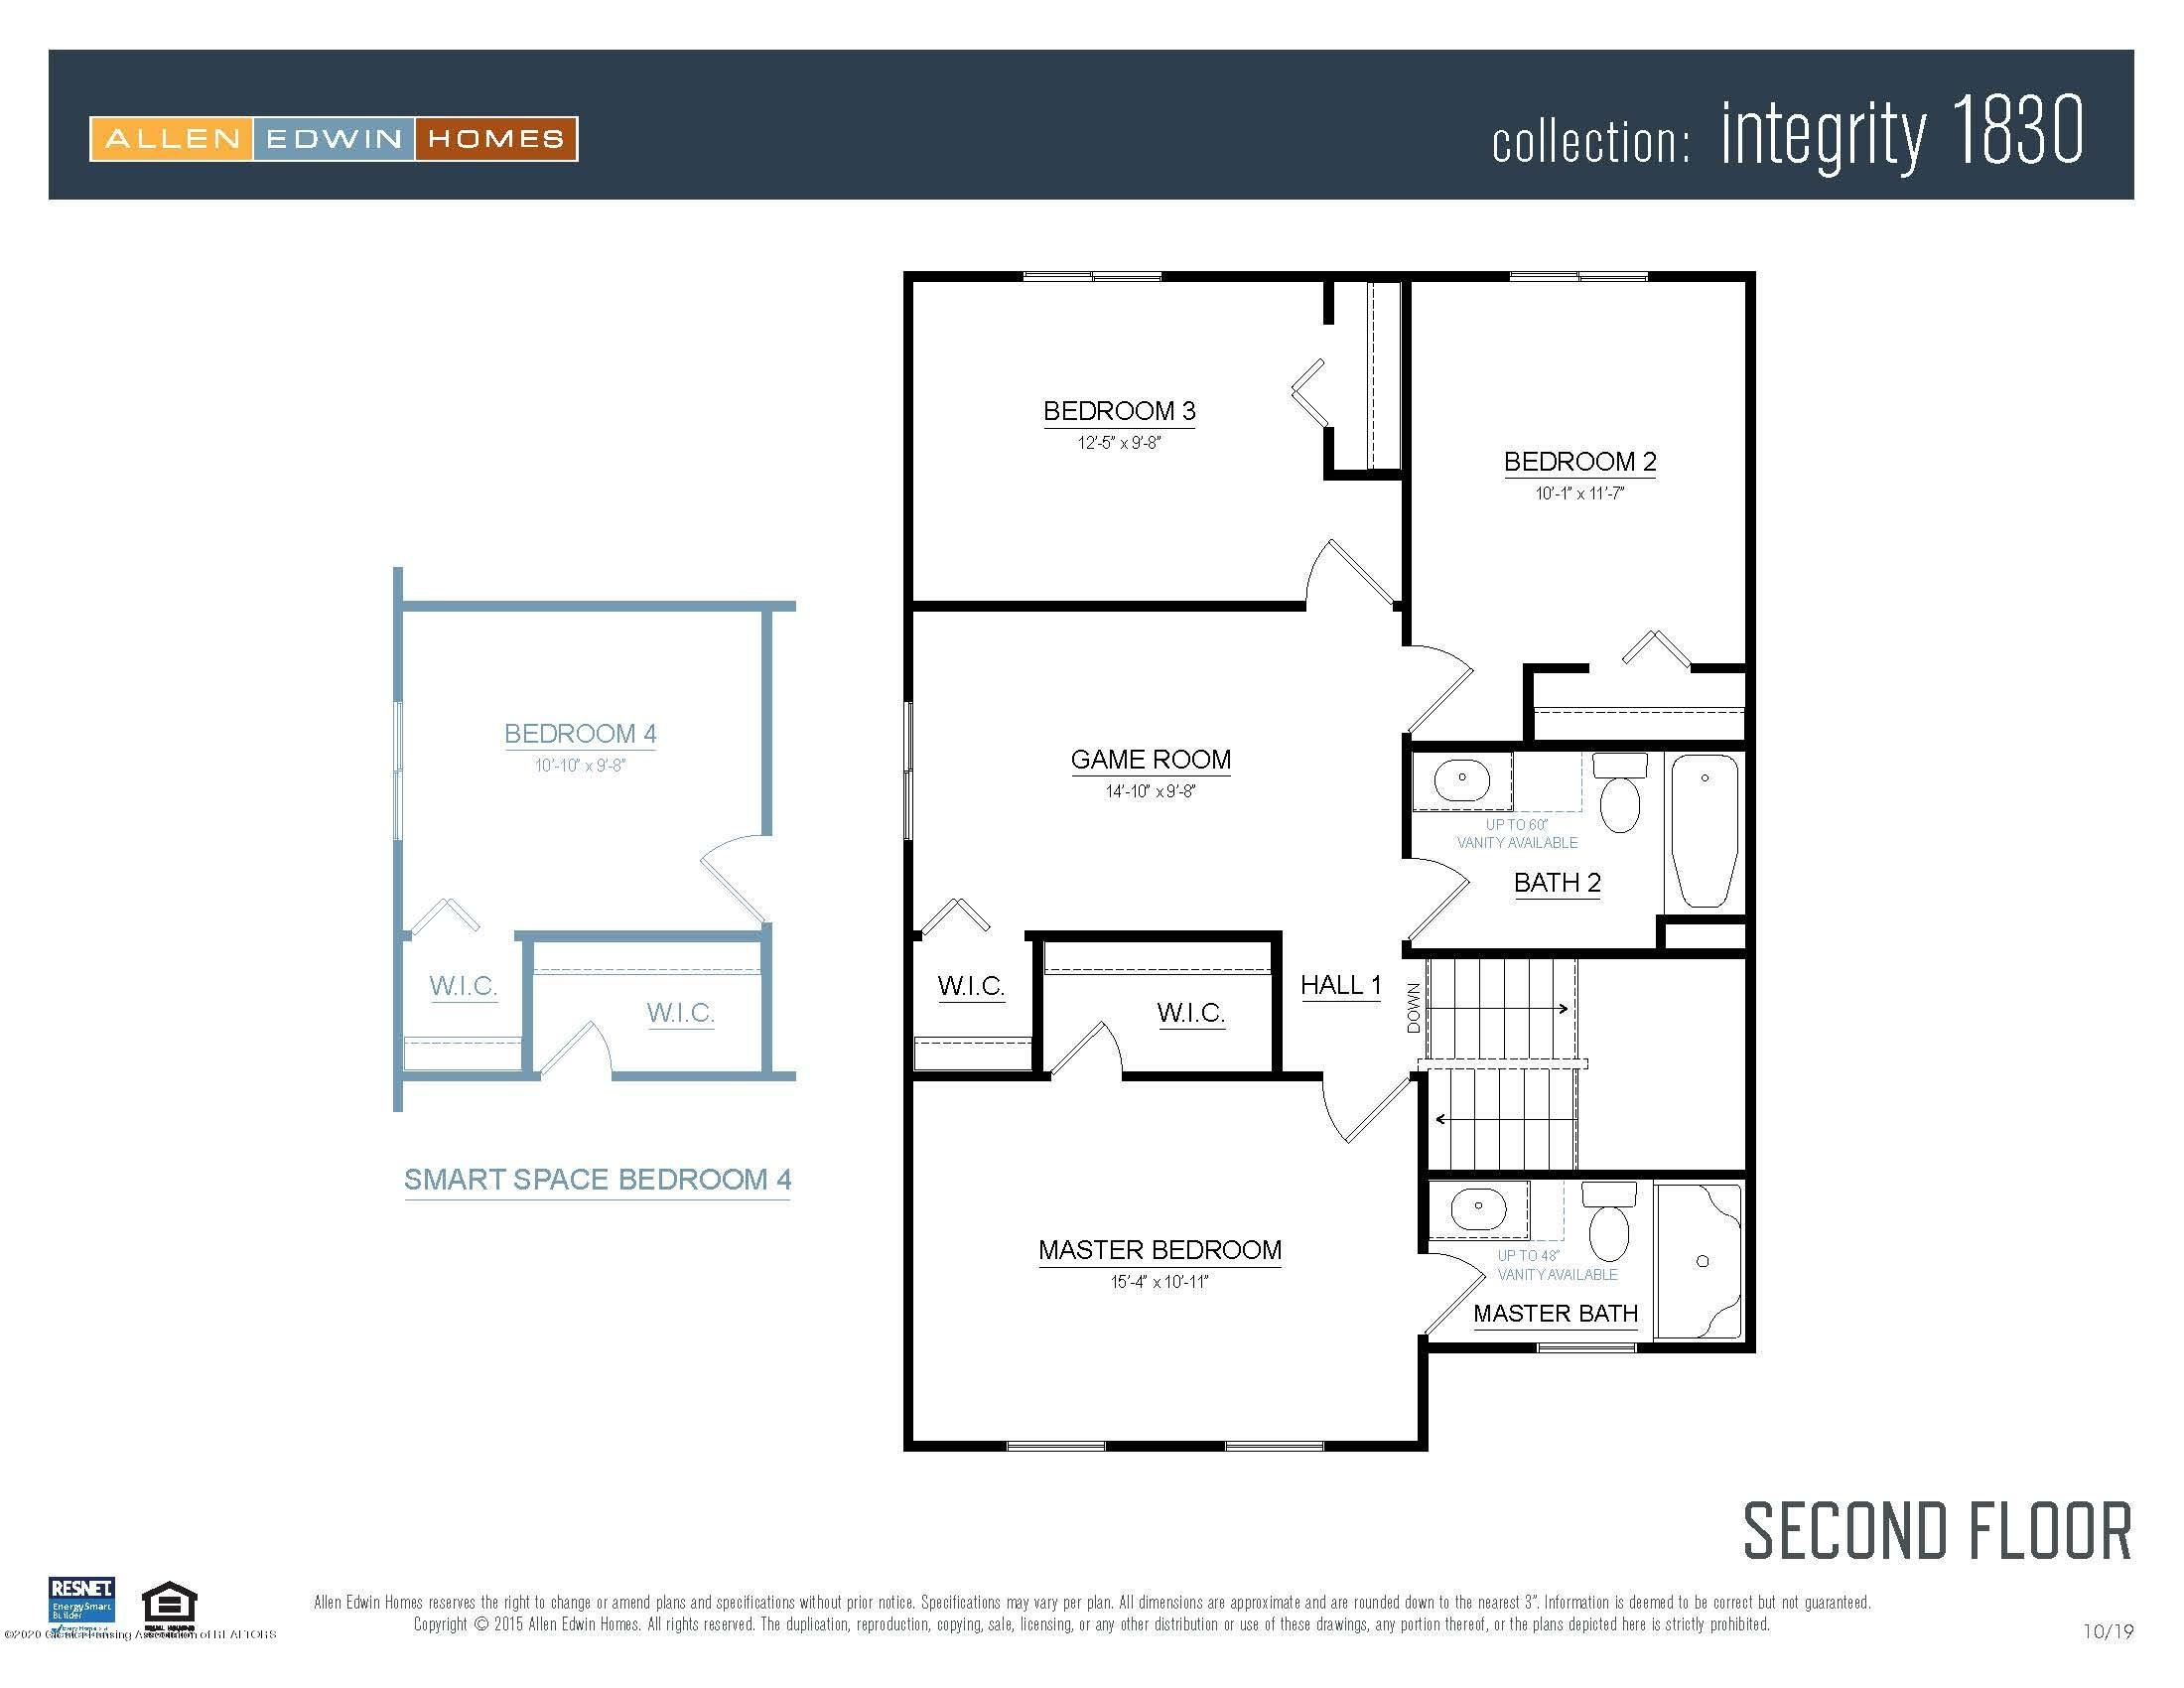 1114 River Oaks Dr - Integrity 1830 V8.1b Second Floor - 18